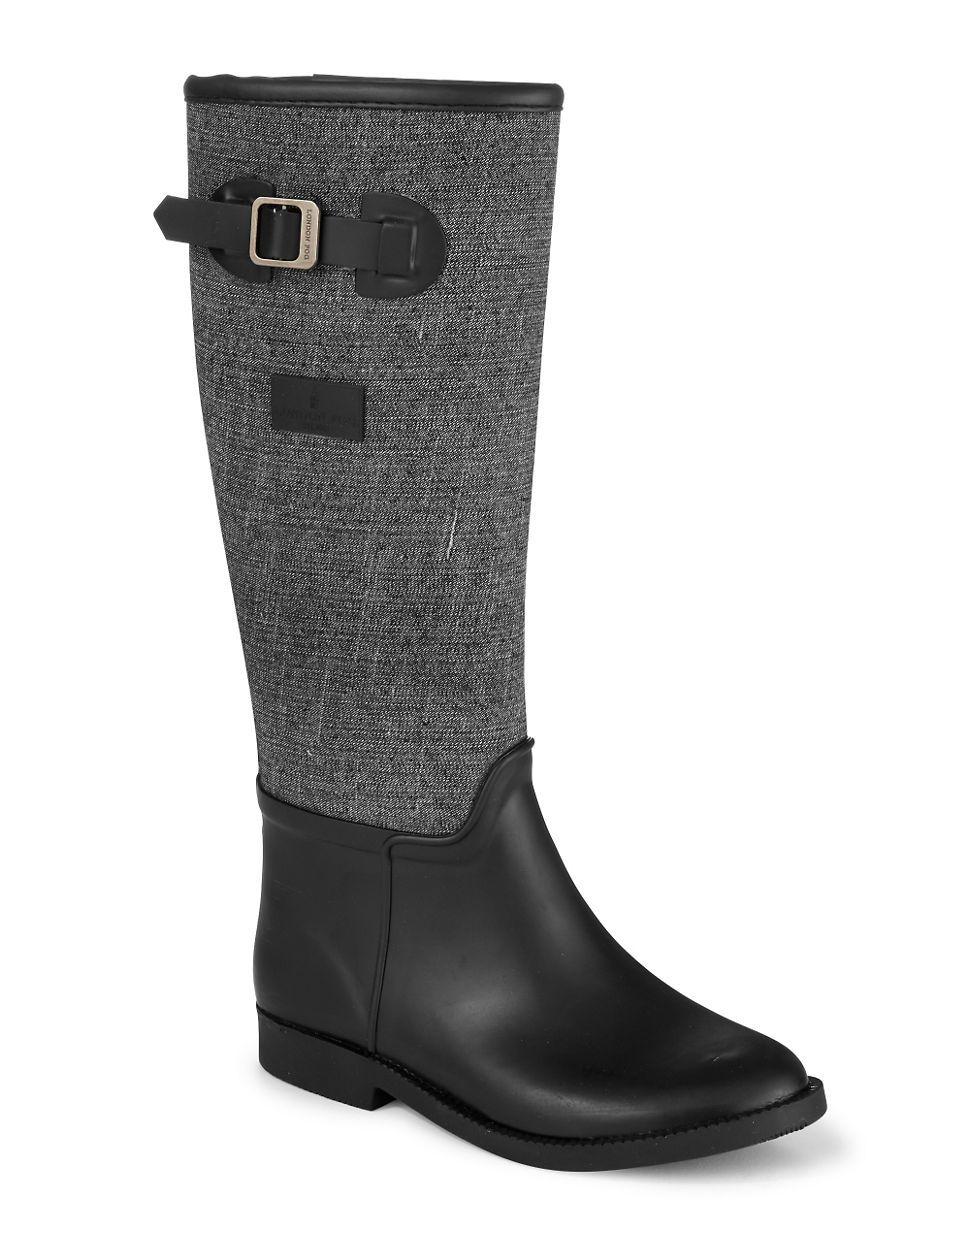 Shoes | Rain Boots | Pammy Rainboot | Hudson's Bay